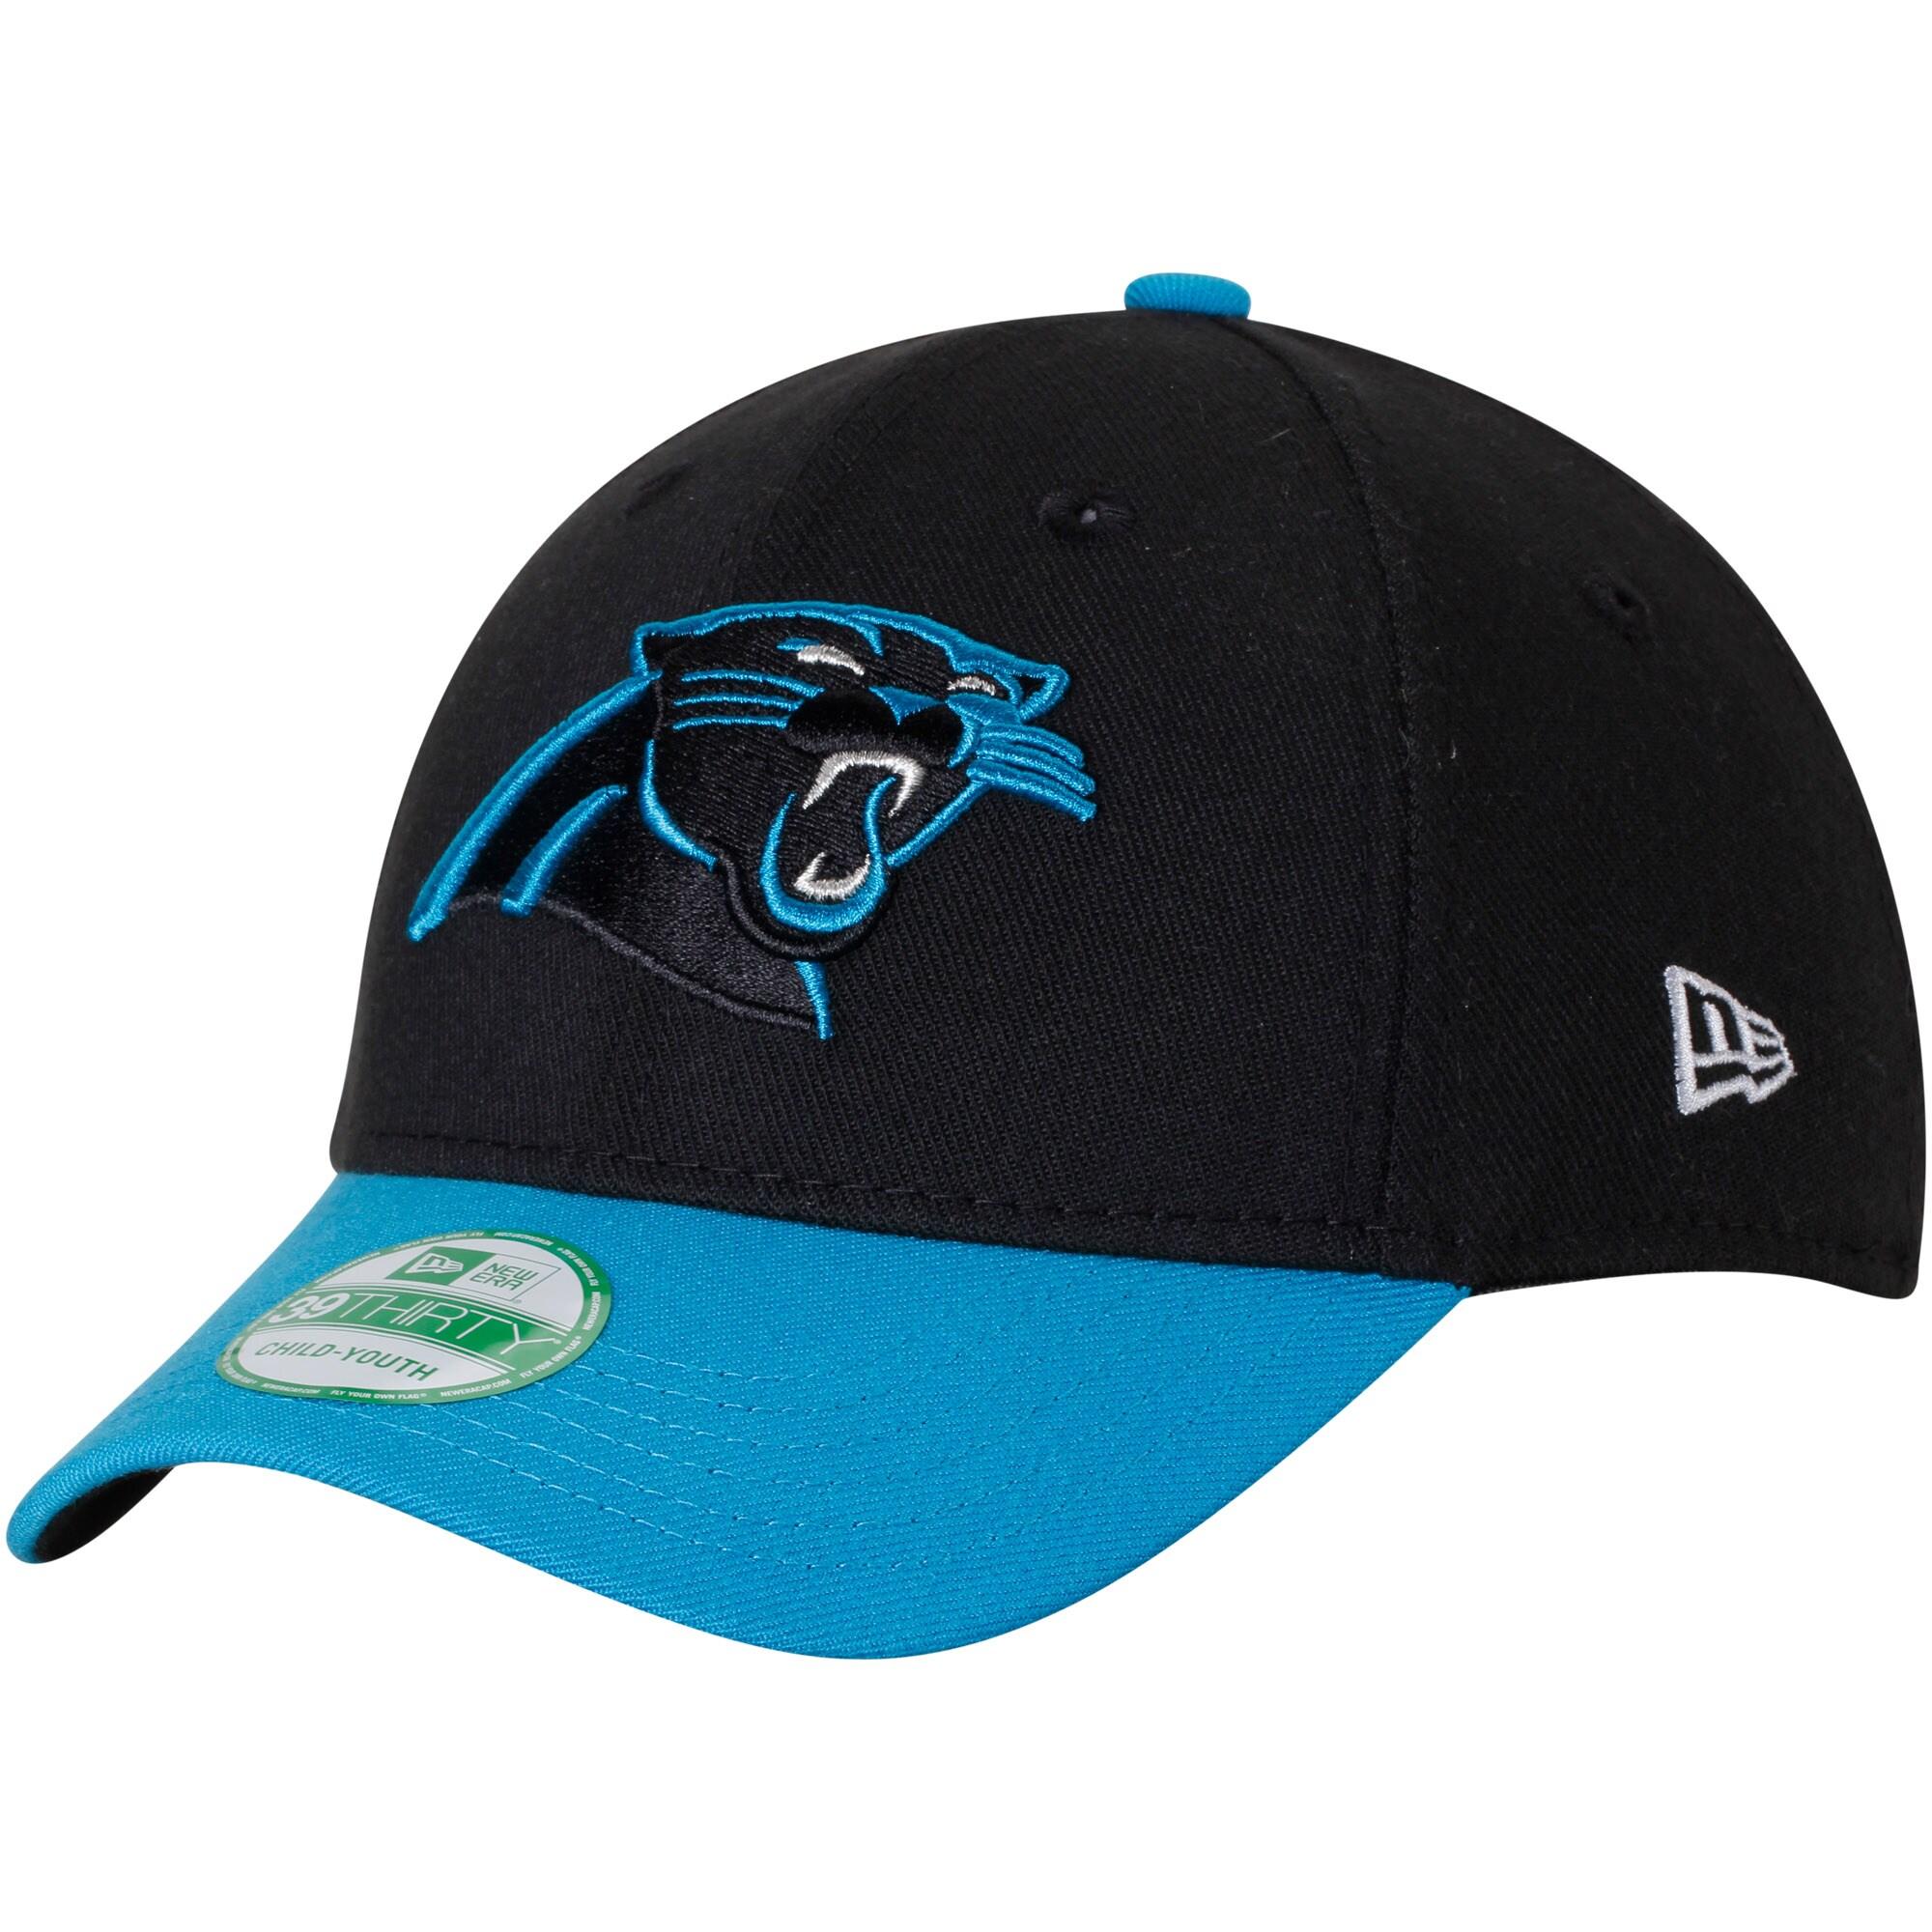 Carolina Panthers New Era Youth Team Classic 39THIRTY Flex Hat - Black/Blue